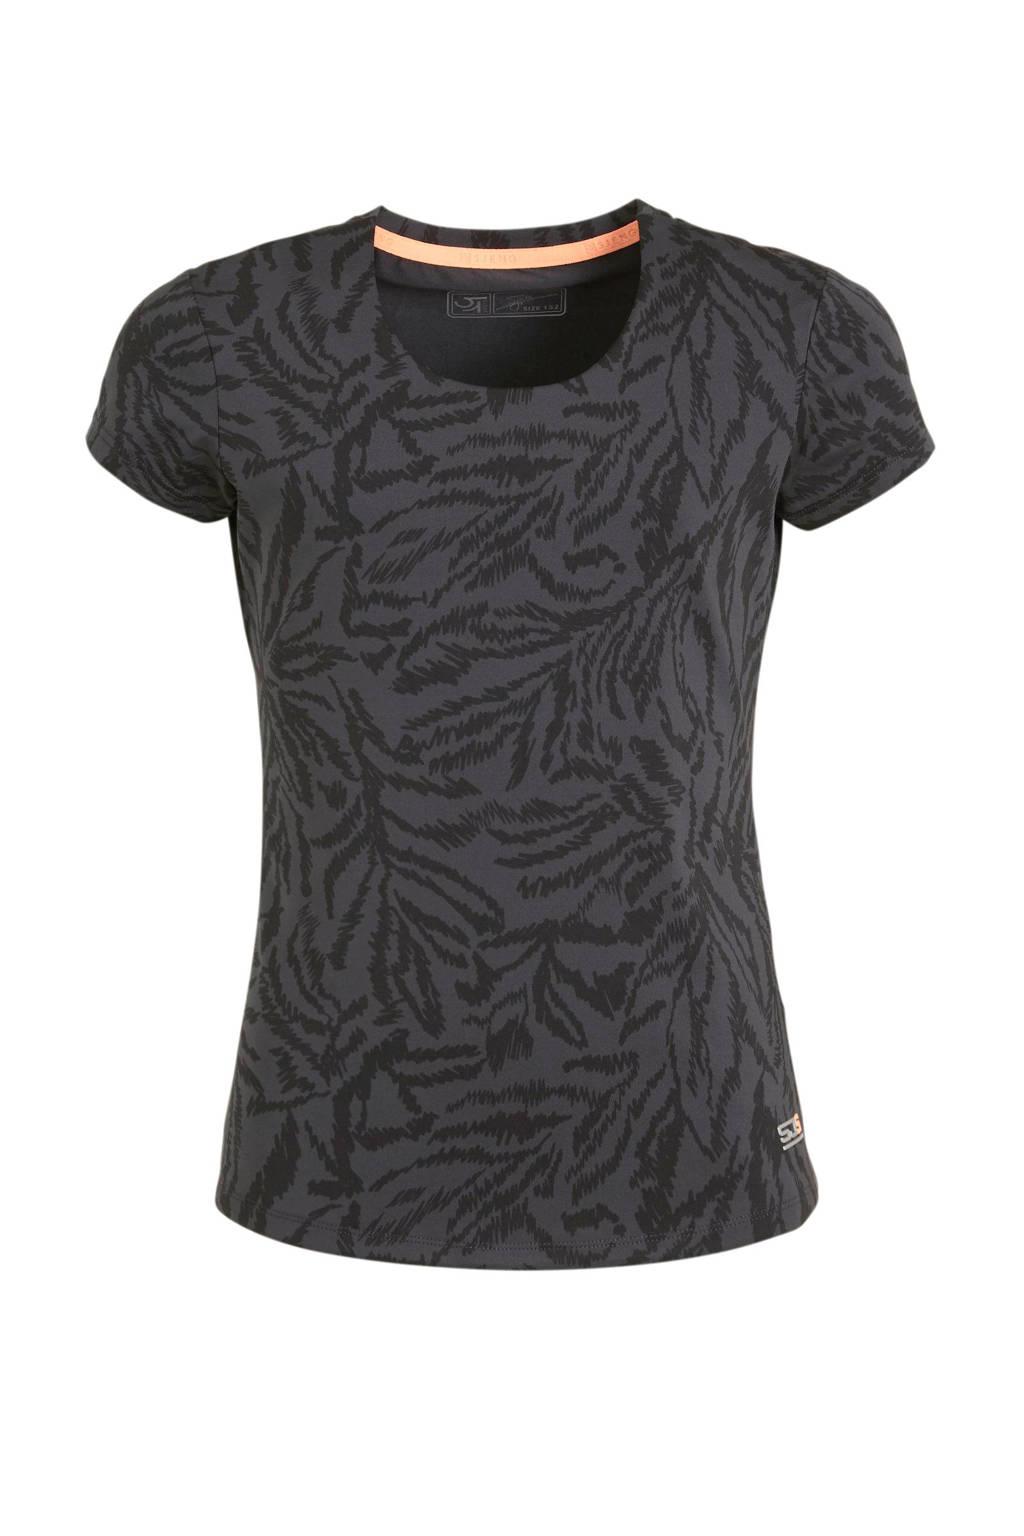 Sjeng Sports T-shirt Michelle Jr. antraciet, Antraciet